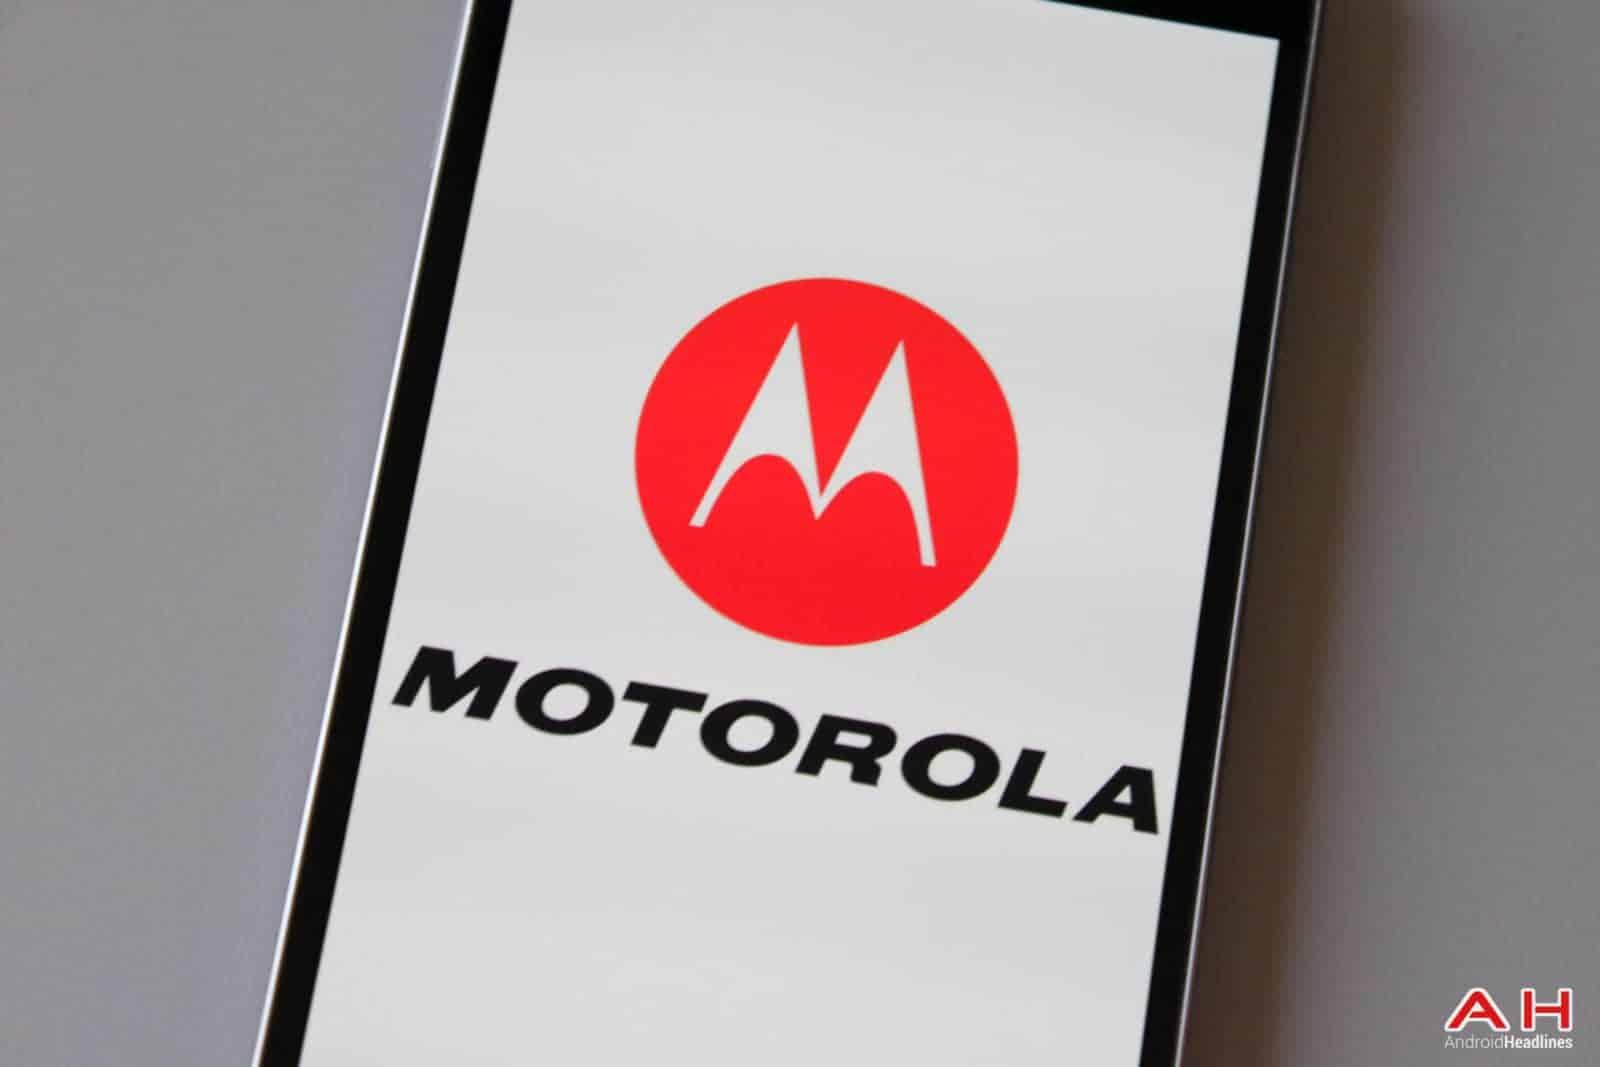 AH Motorola Logo 1.0